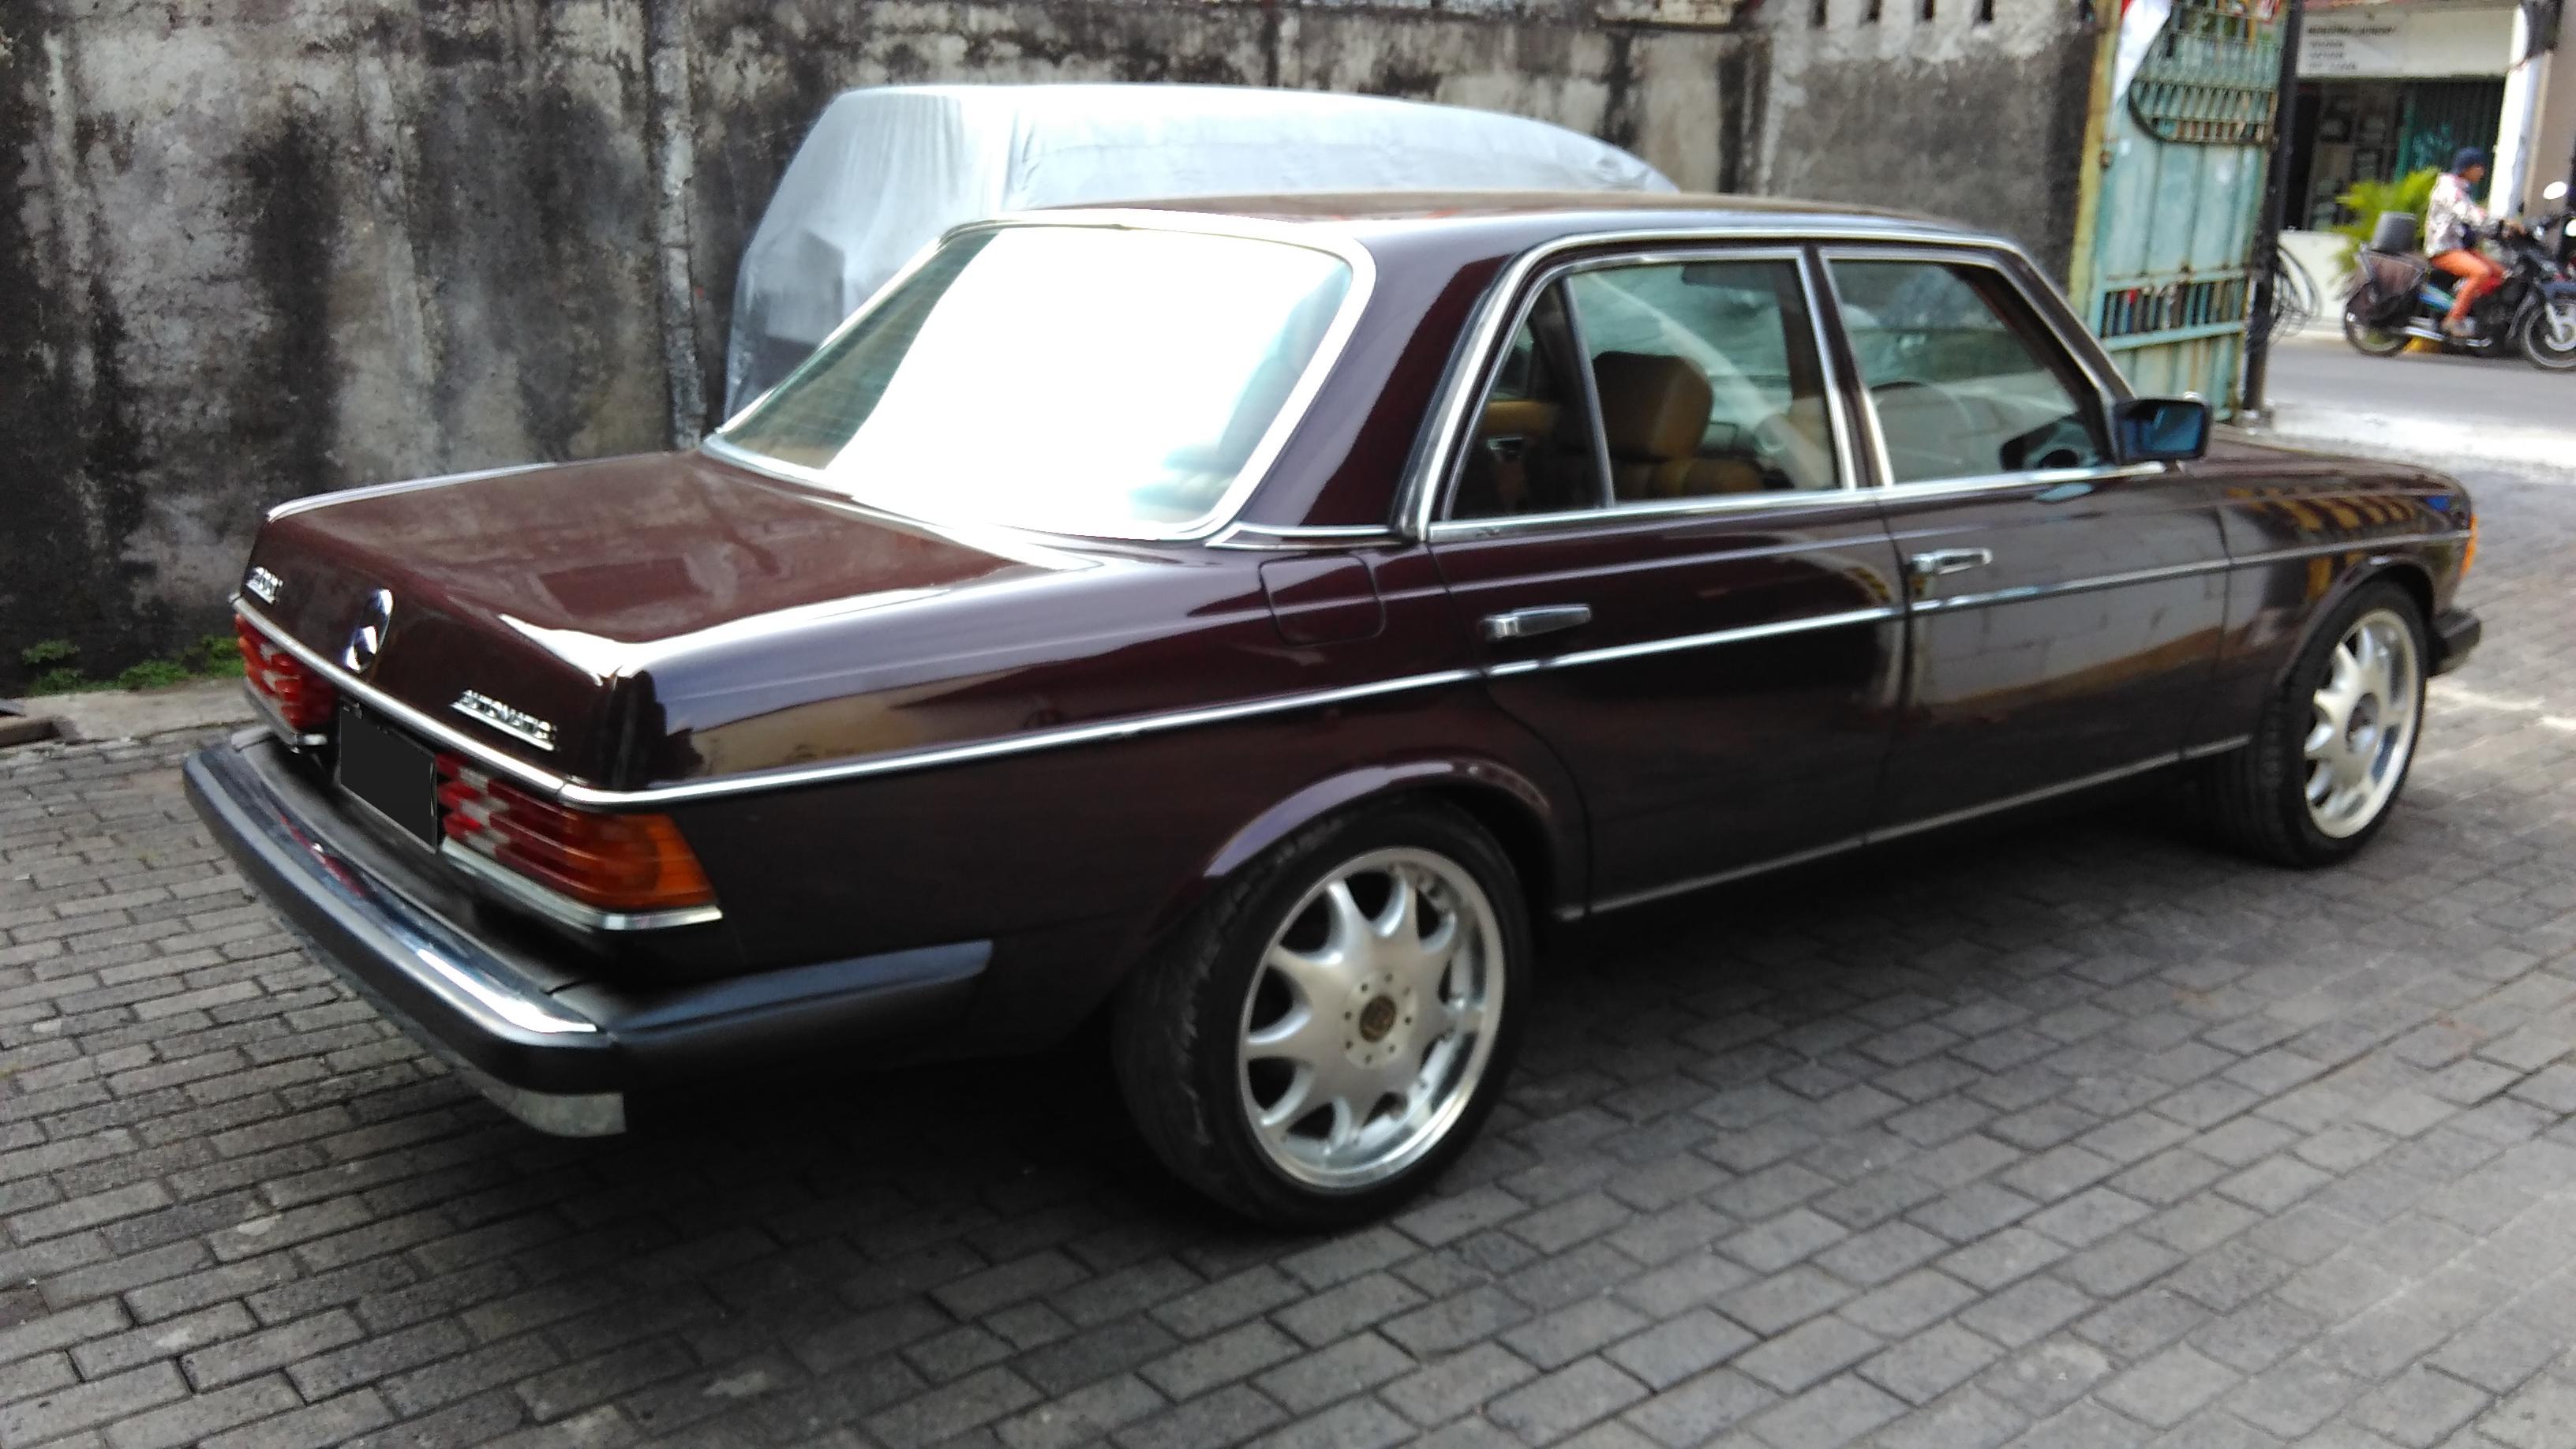 1984 mercedes benz 200 w123 garasi 64 for 1984 mercedes benz